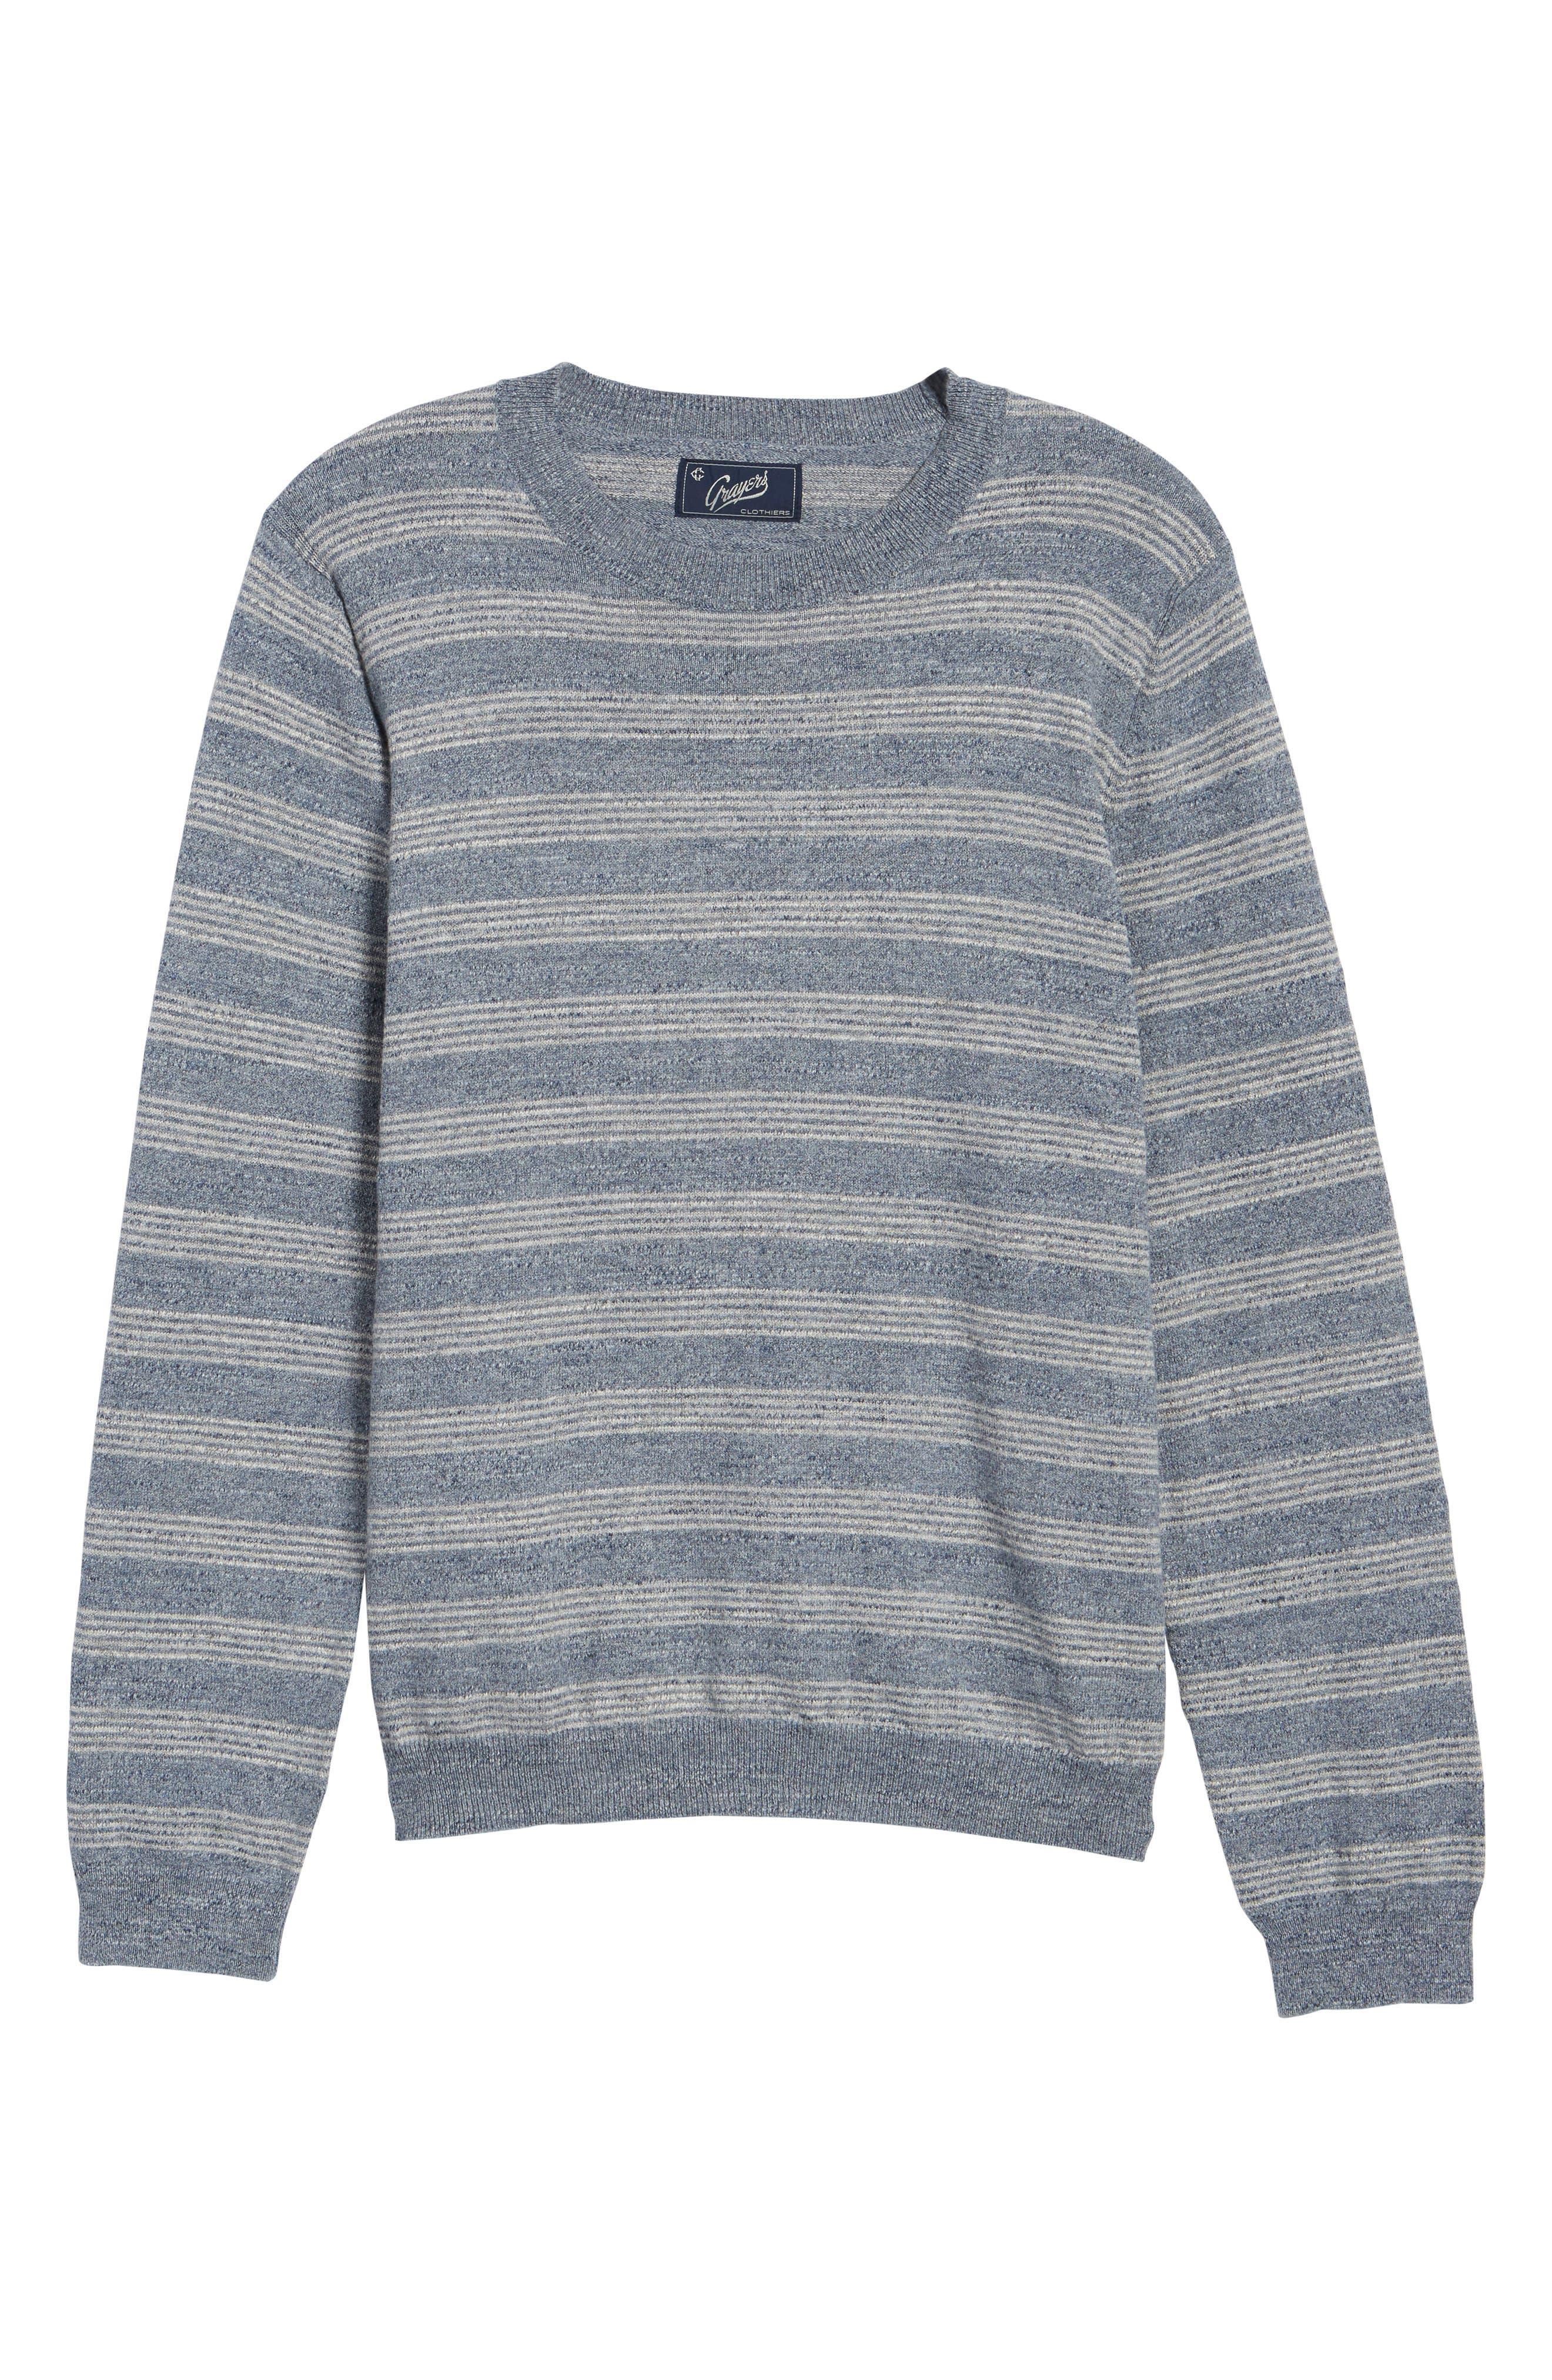 Stripe Cotton Sweater,                             Alternate thumbnail 6, color,                             Blue Grey Heather Stripe